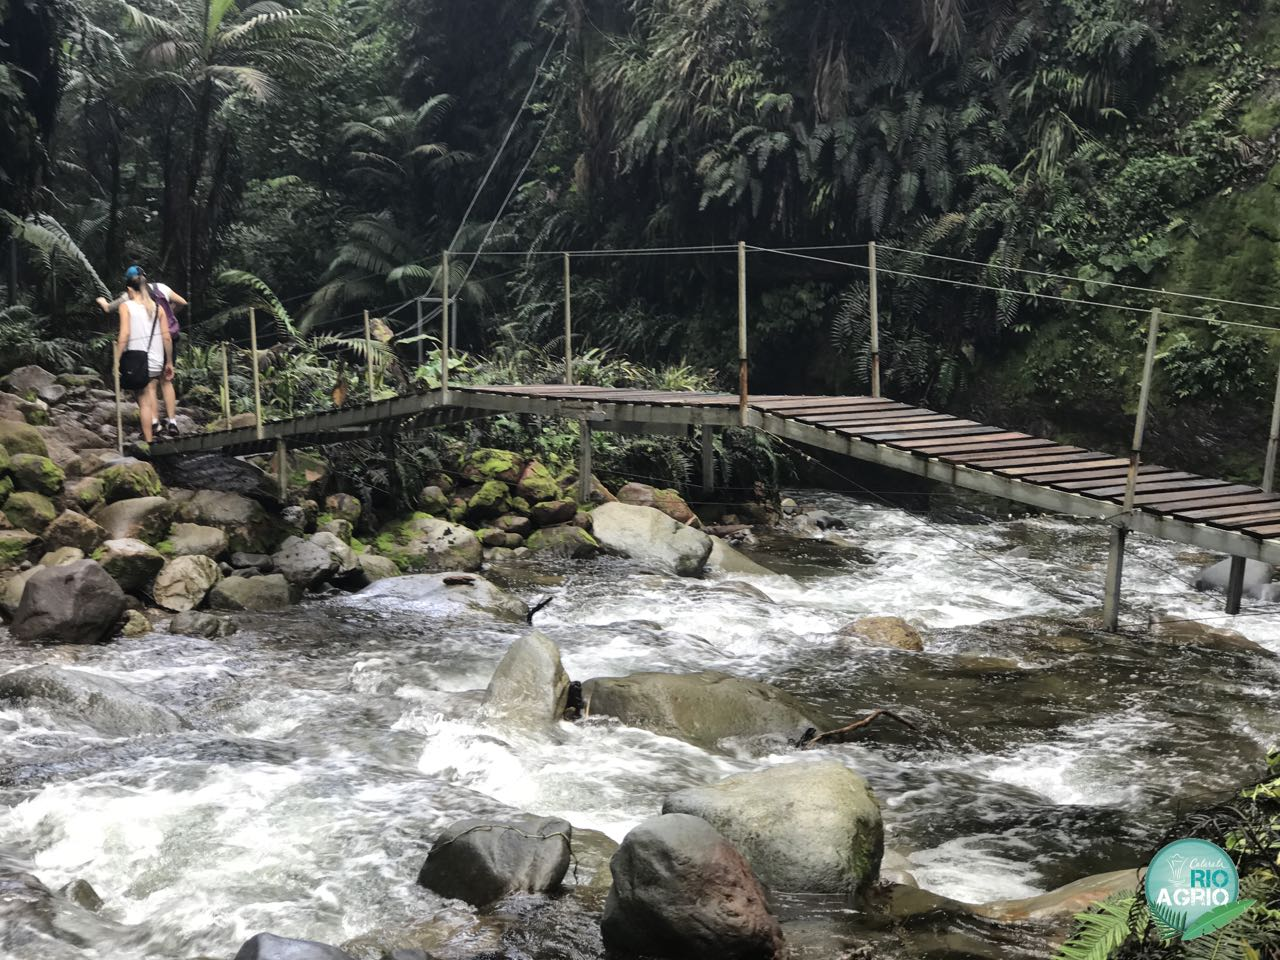 Catarata Río Agrio 4